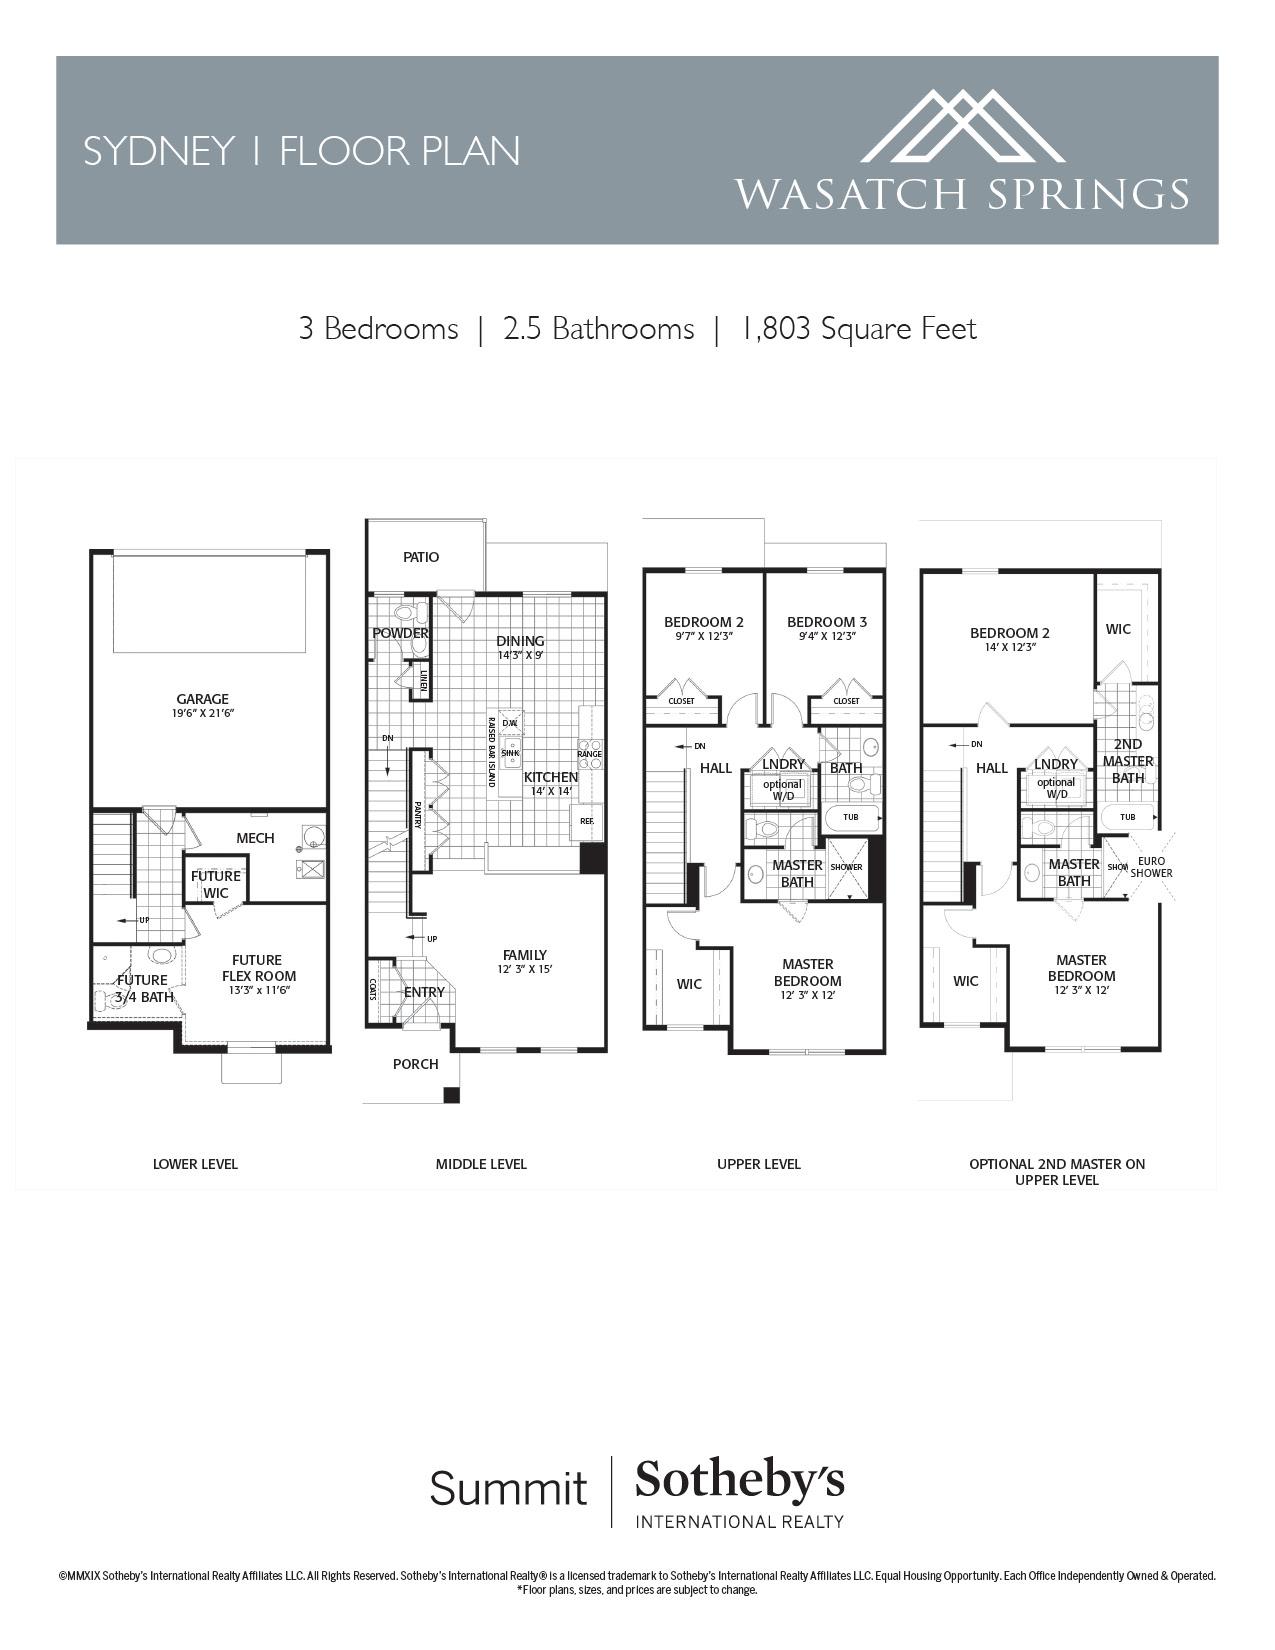 Sydney 1 Floor Plan.jpg